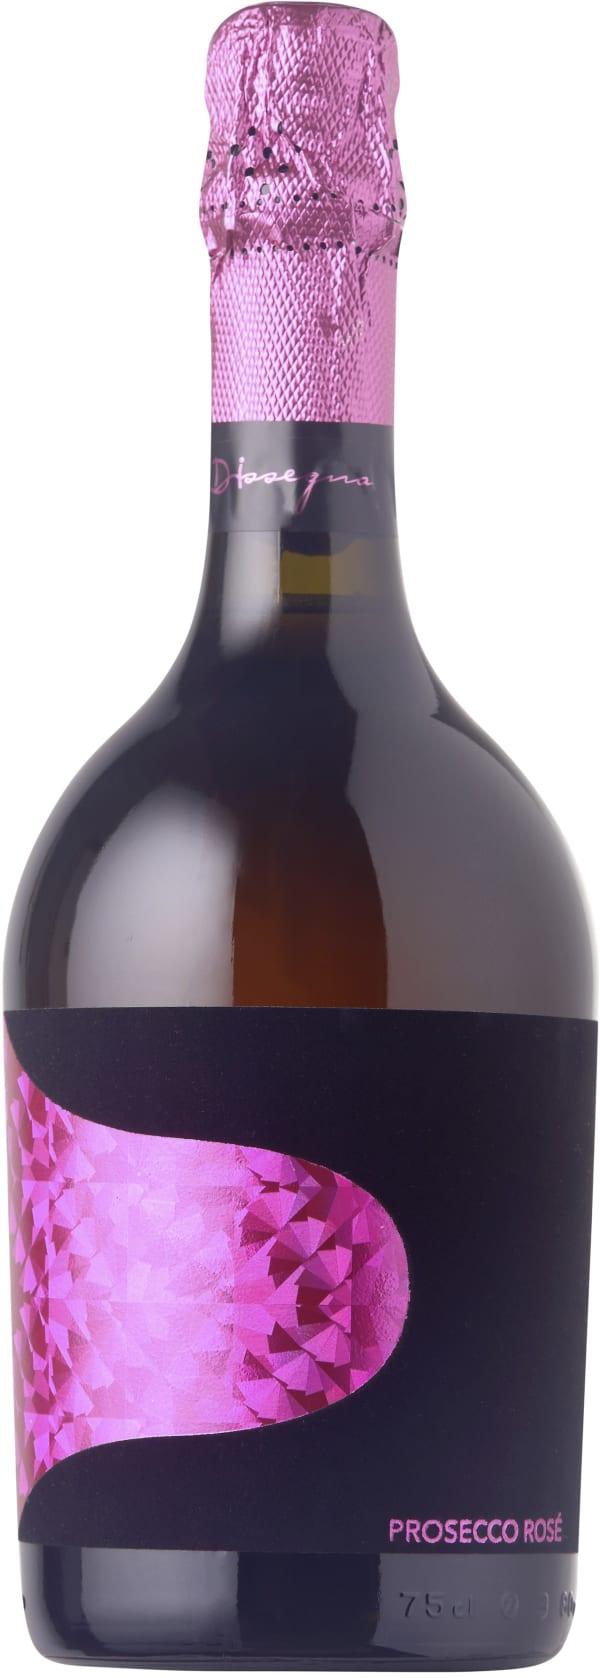 Dissegna Organic Prosecco Rosé Extra Dry